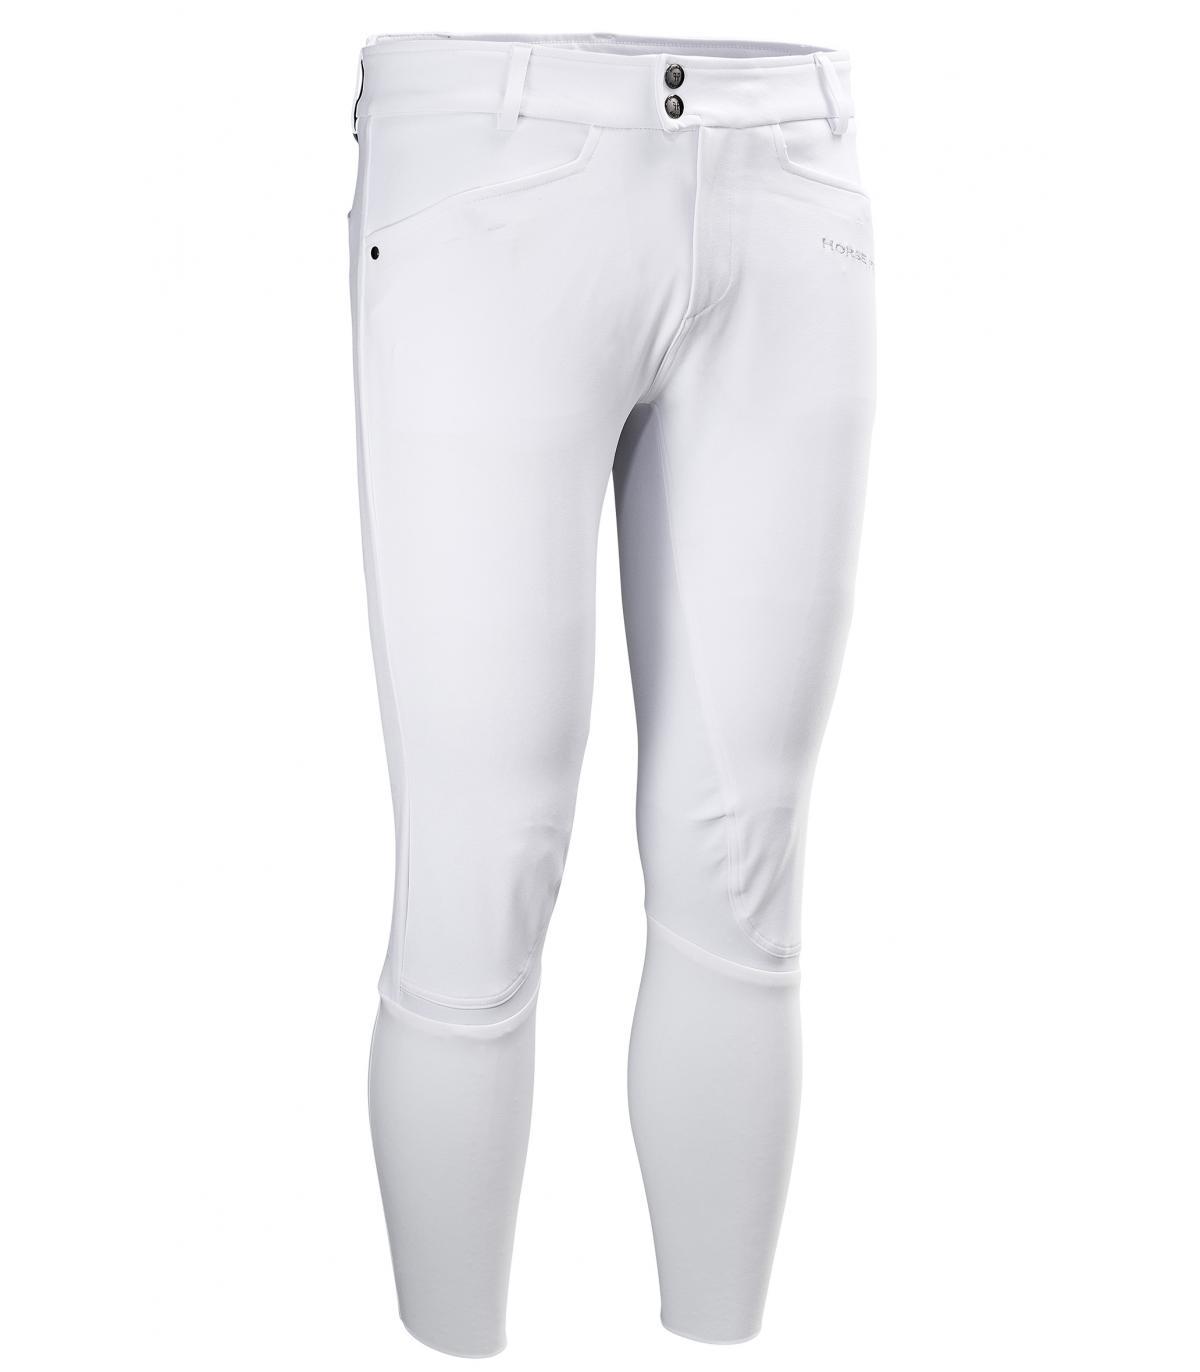 Pantalon blanc homme Horse Pilot X balance